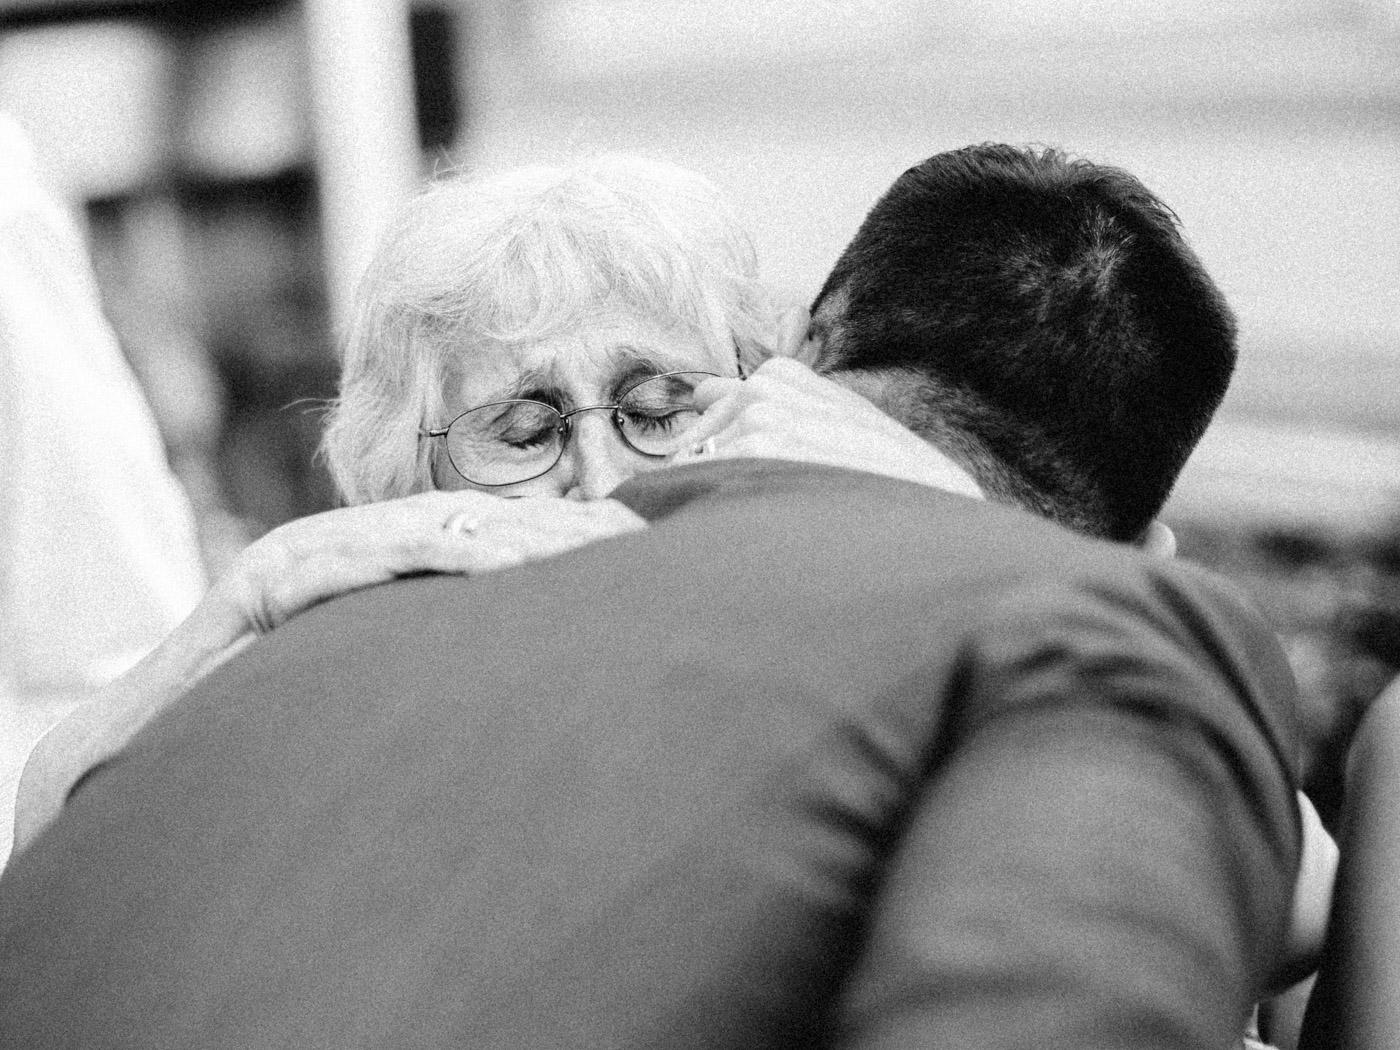 toronto_wedding_photographer_fine_art_documentary-370.jpg